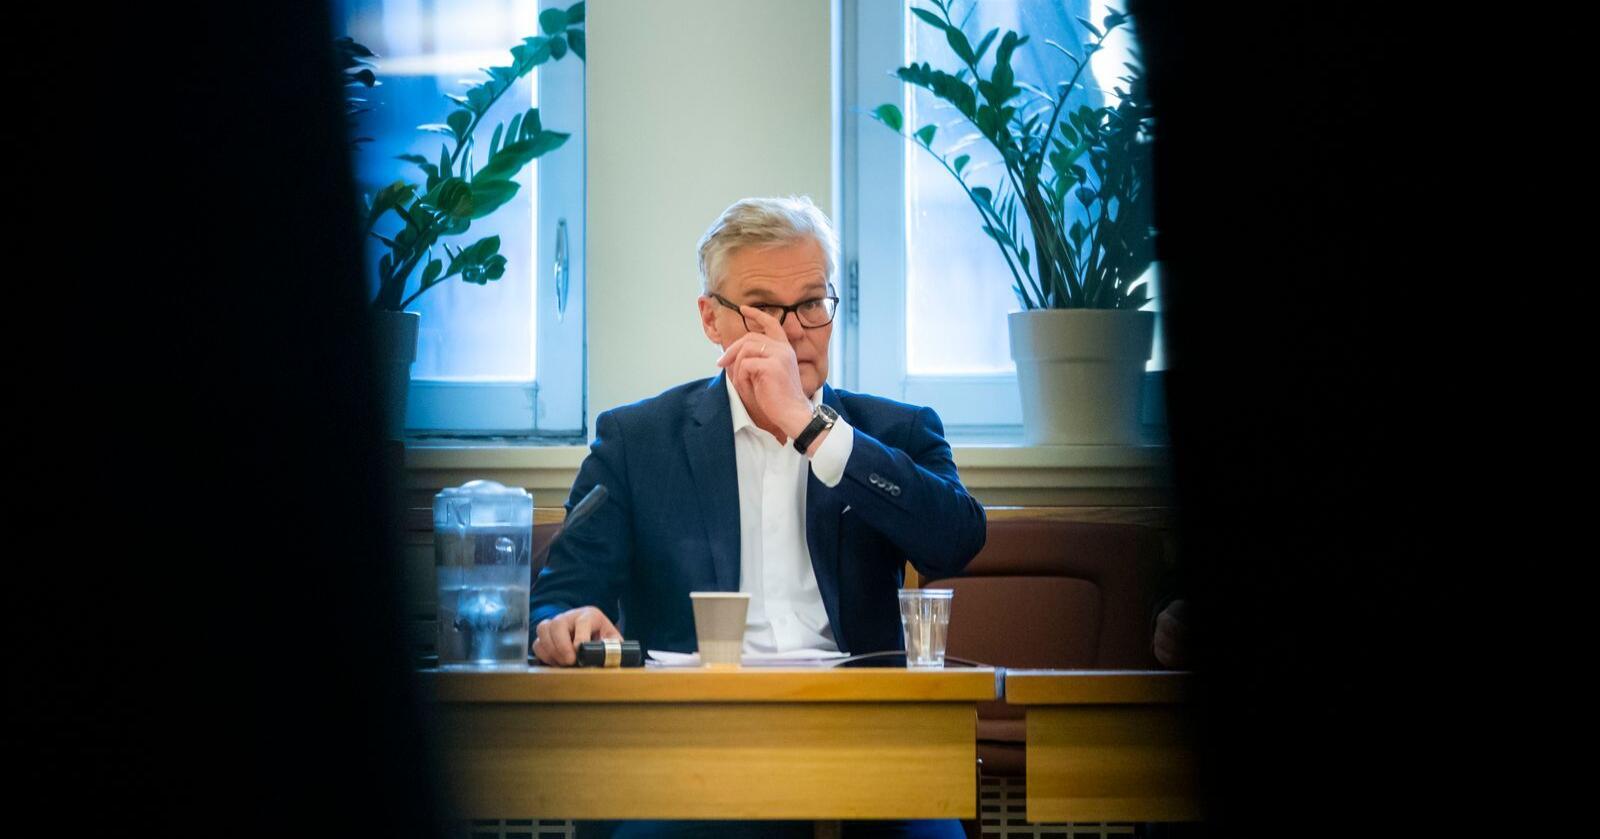 Hans Andreas Limi er parlamentarisk leder for Fremskrittspartiet i Stortinget. Foto: Håkon Mosvold Larsen / NTB scanpix